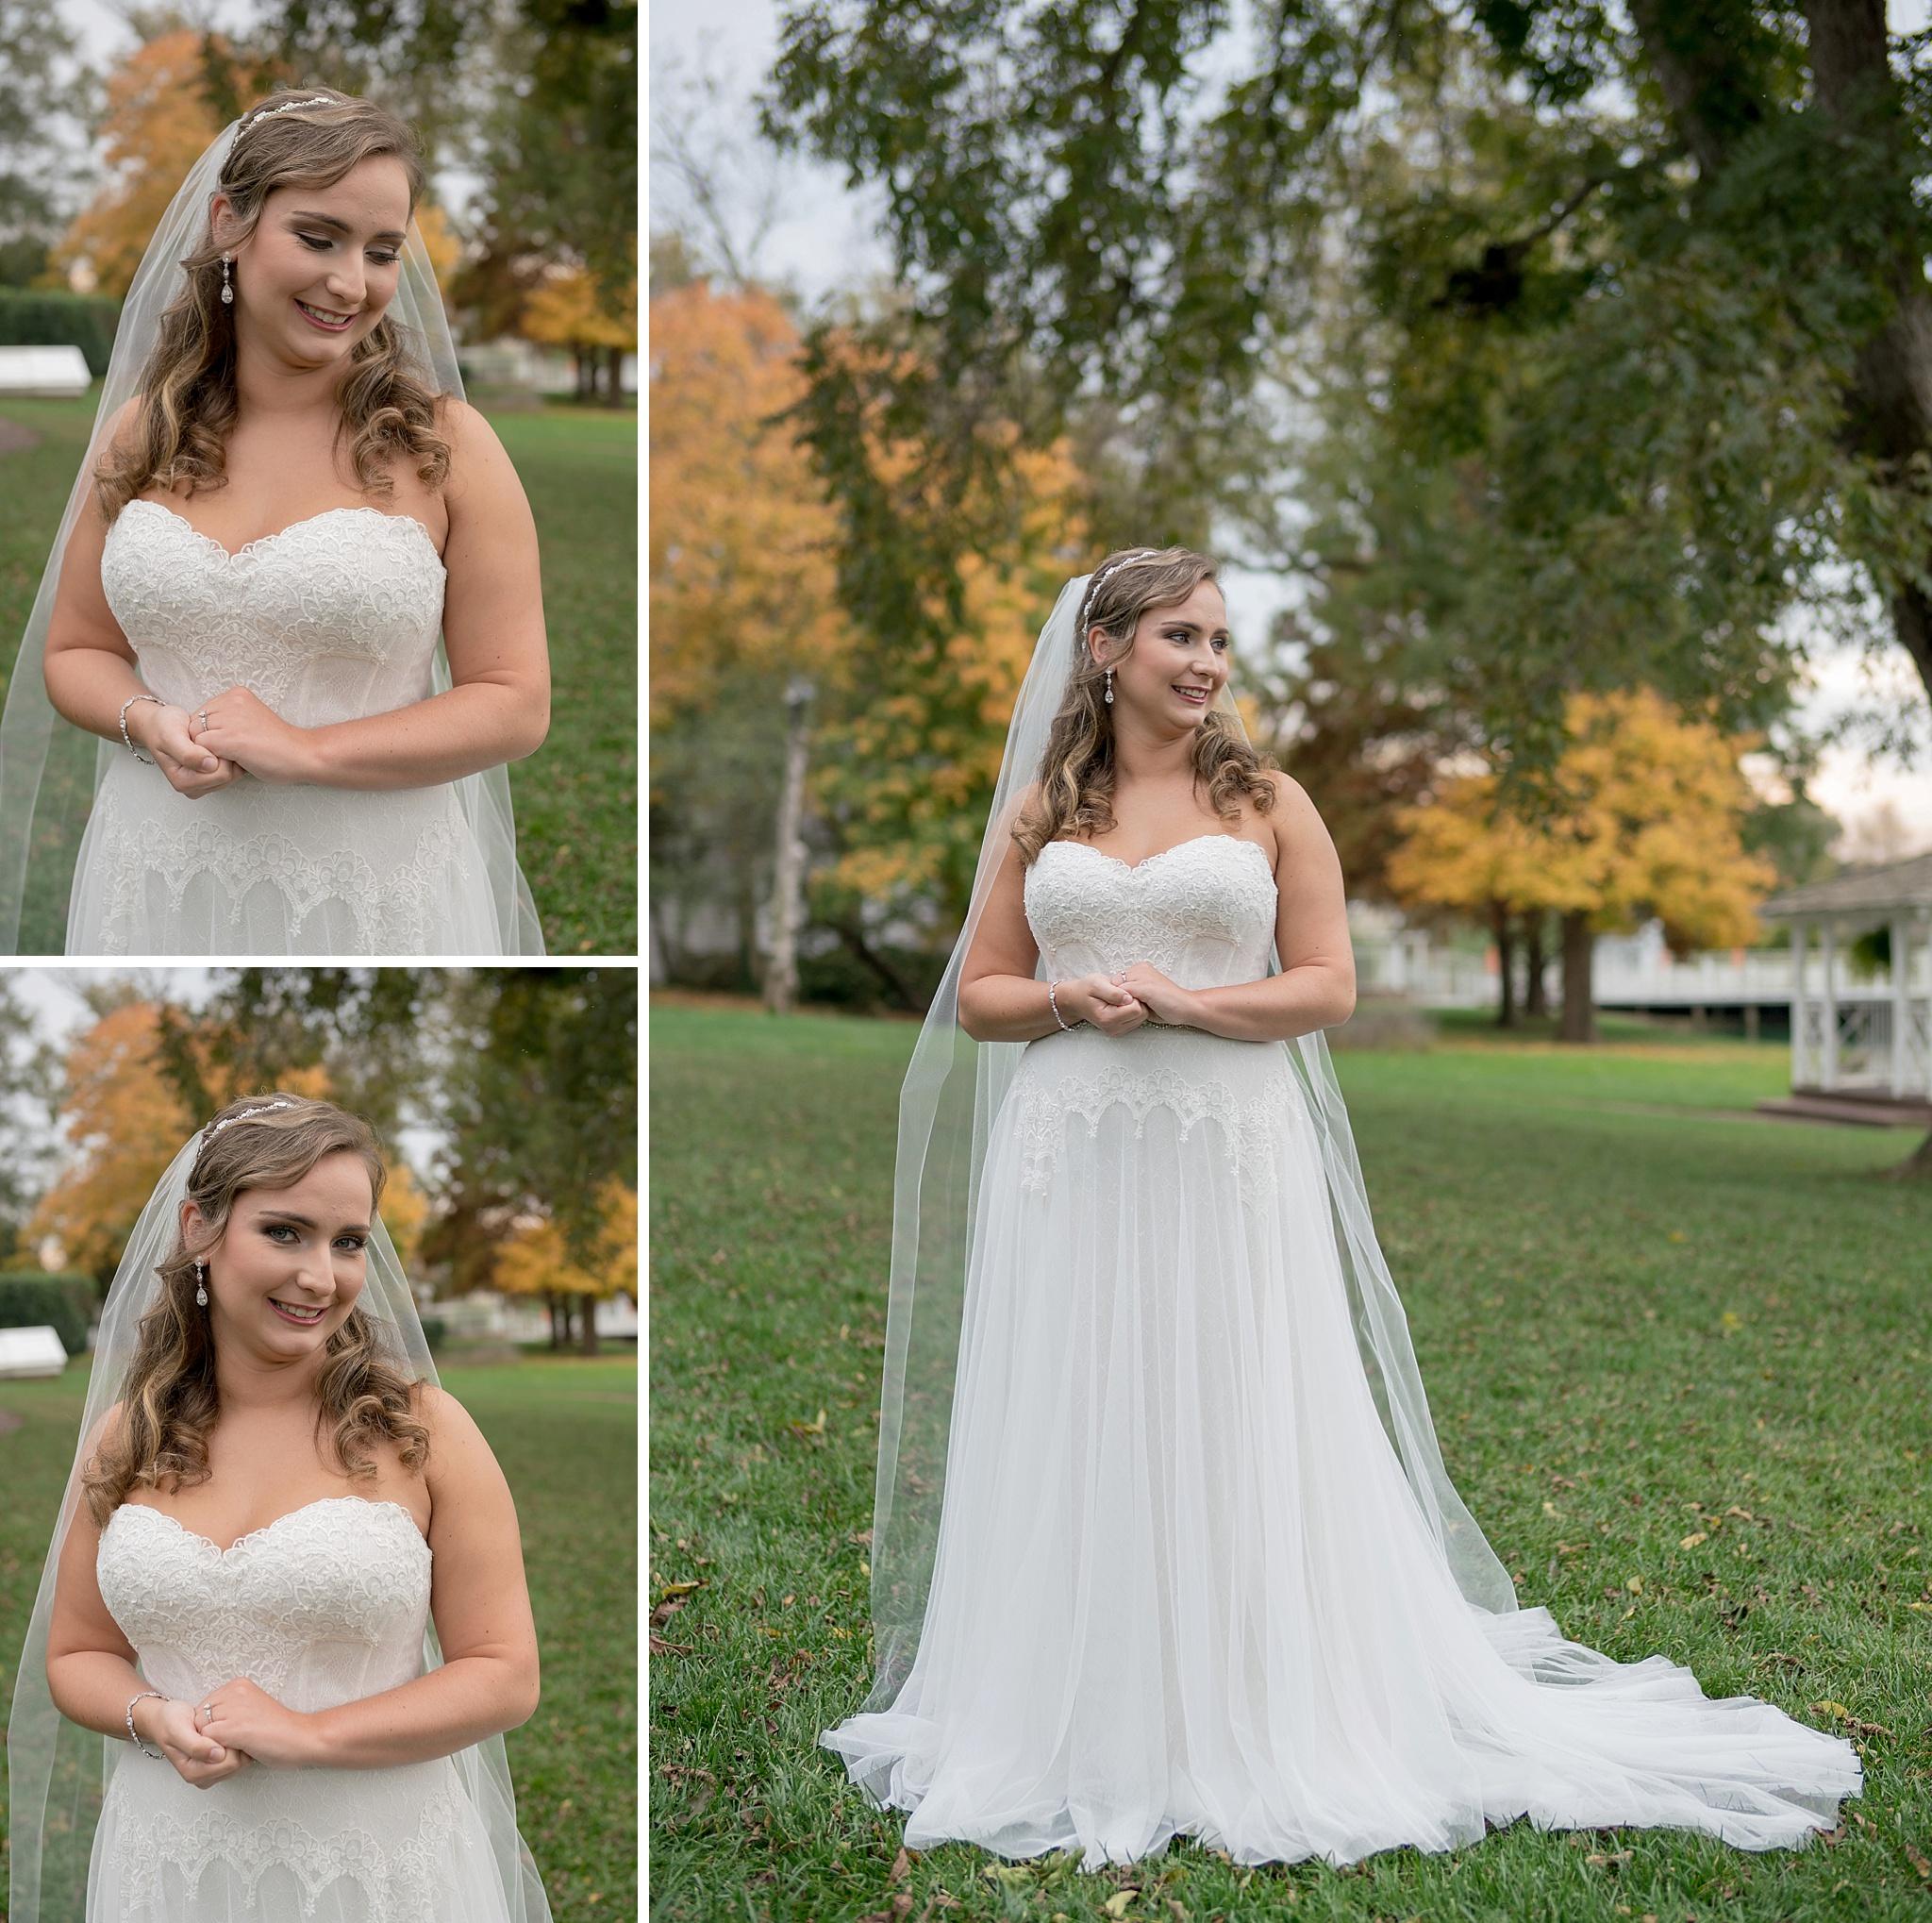 Rose-Hill-Plantation-Wedding-Photographer-056.jpg